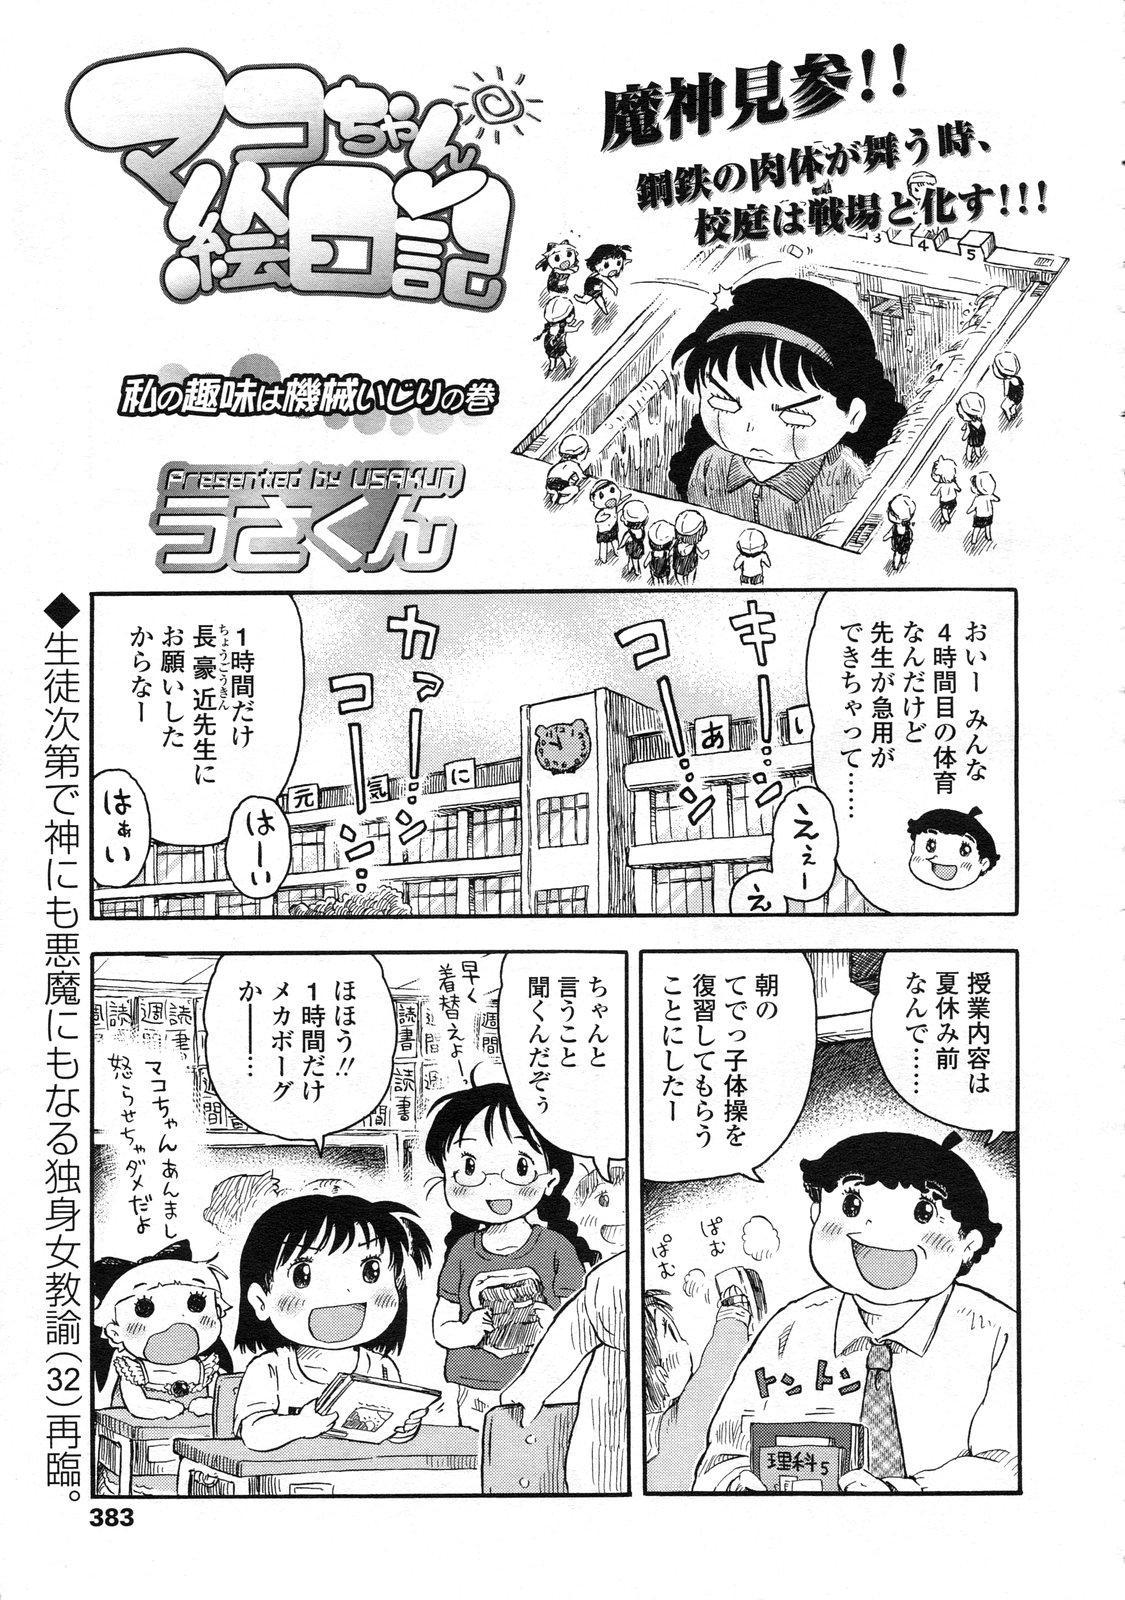 COMIC LO 2009-09 Vol. 66 383